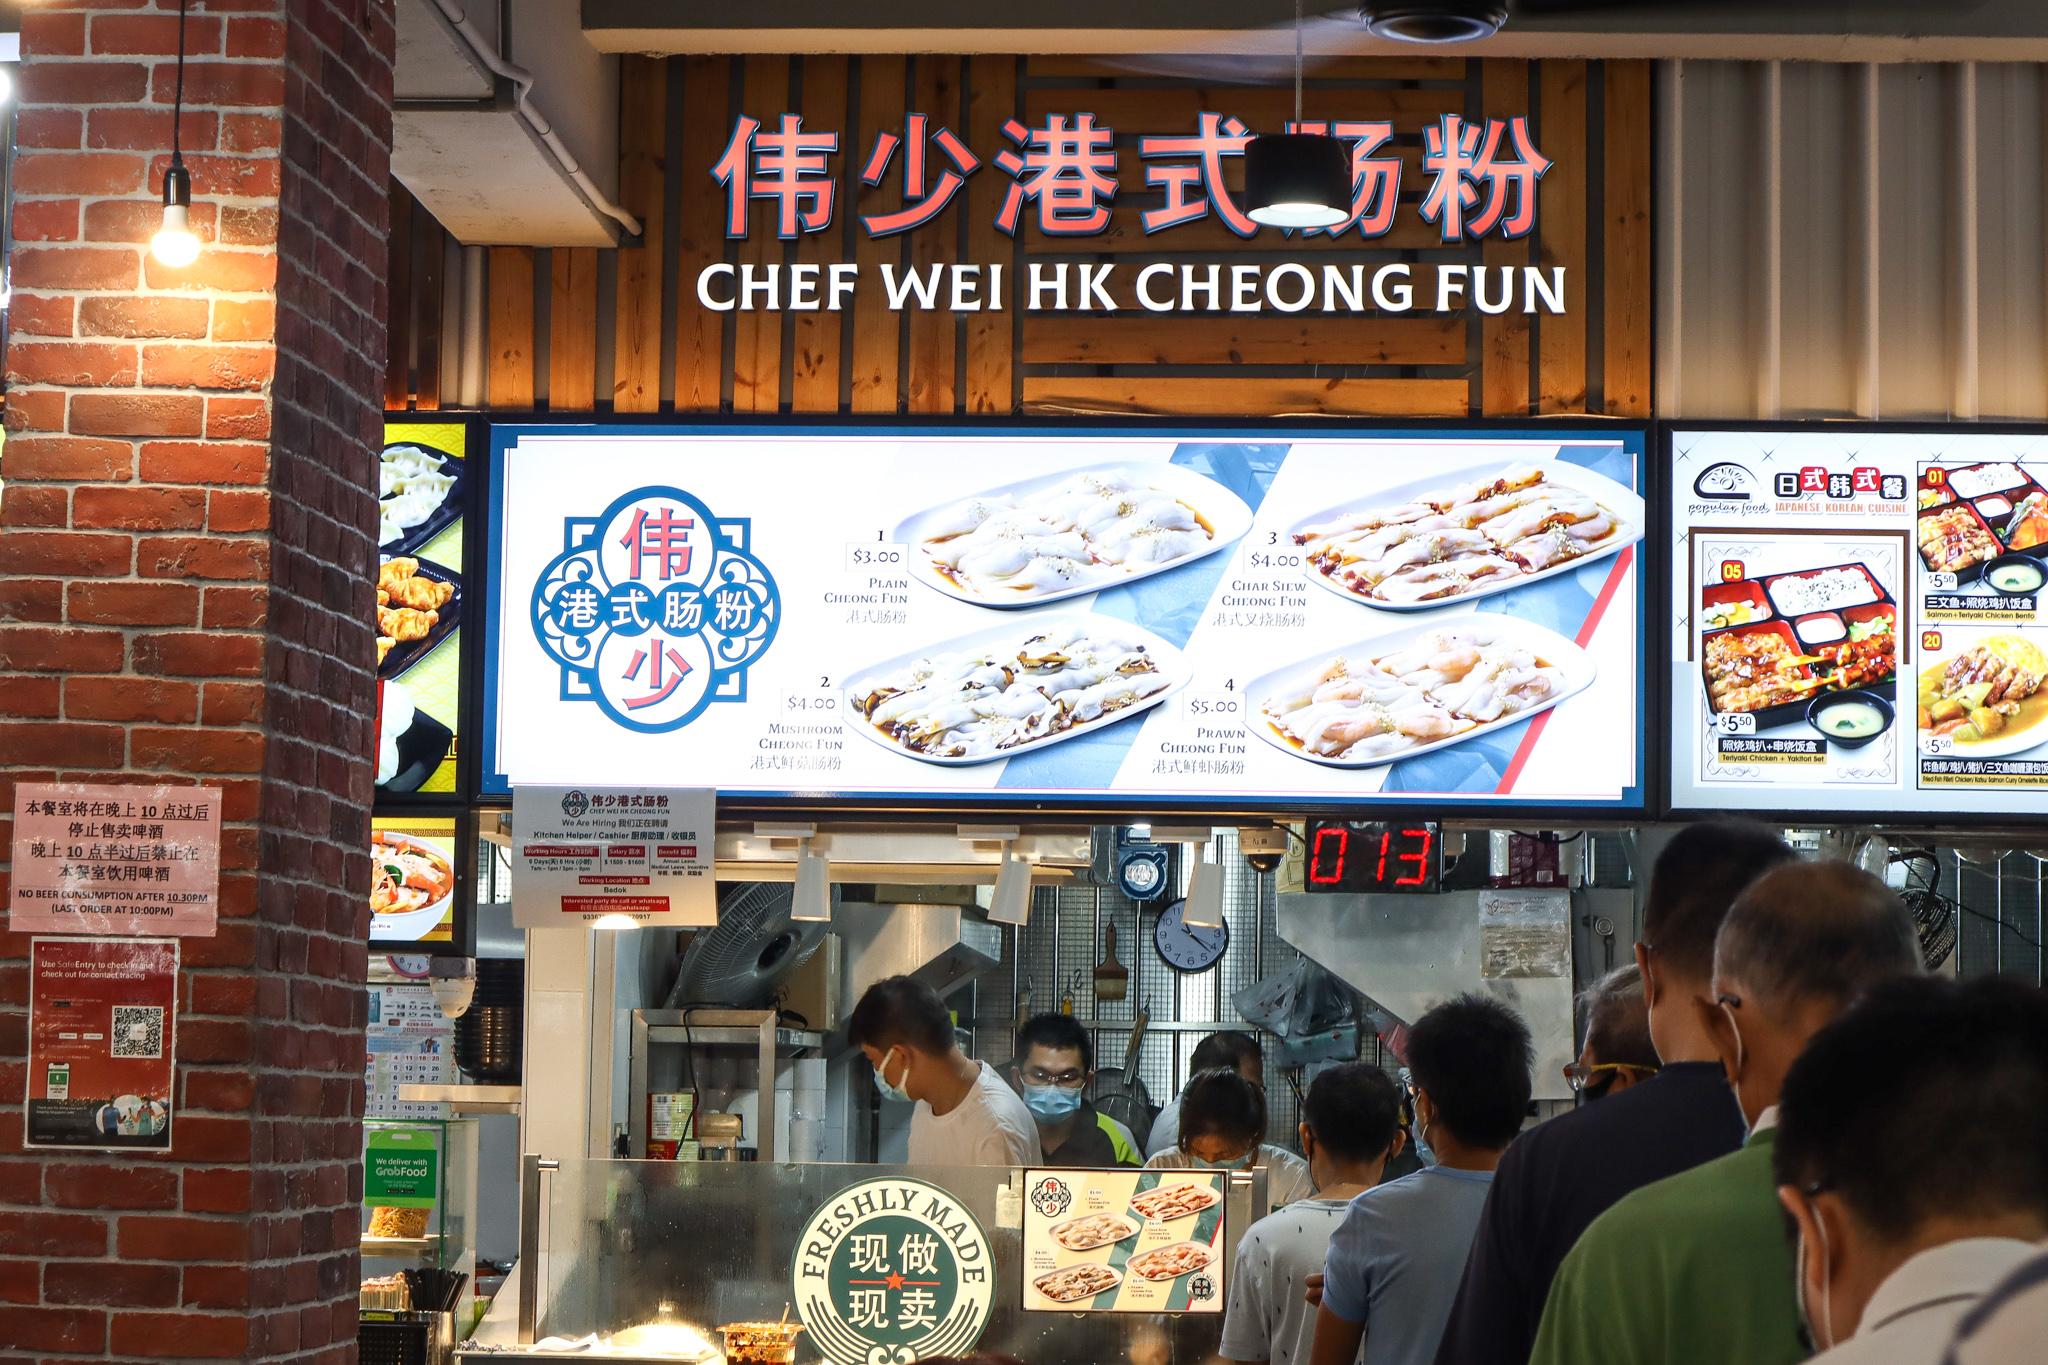 chefweihkcheecheongfun-08